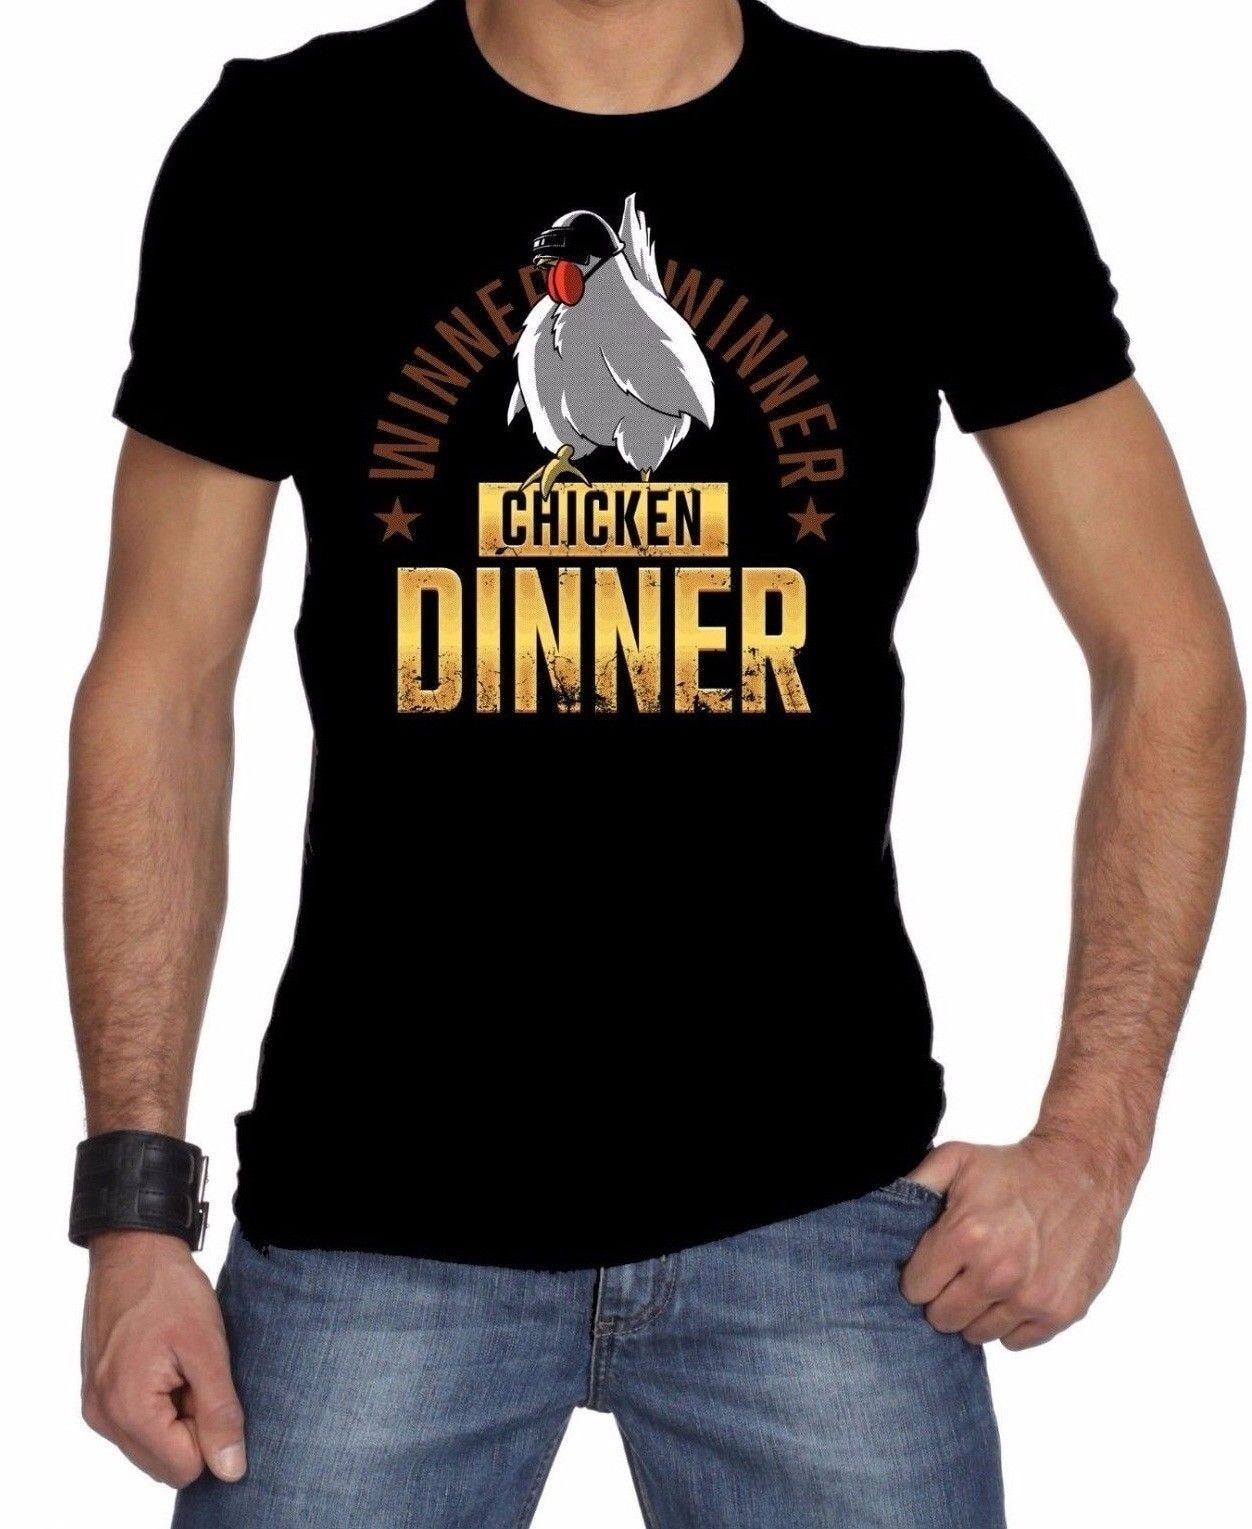 POPULAR !!!! Winner Winner Chicken Dinner Adult PUBG T-shirt Men Woman  Cartoon t shirt men Unisex New Fashion tshirt